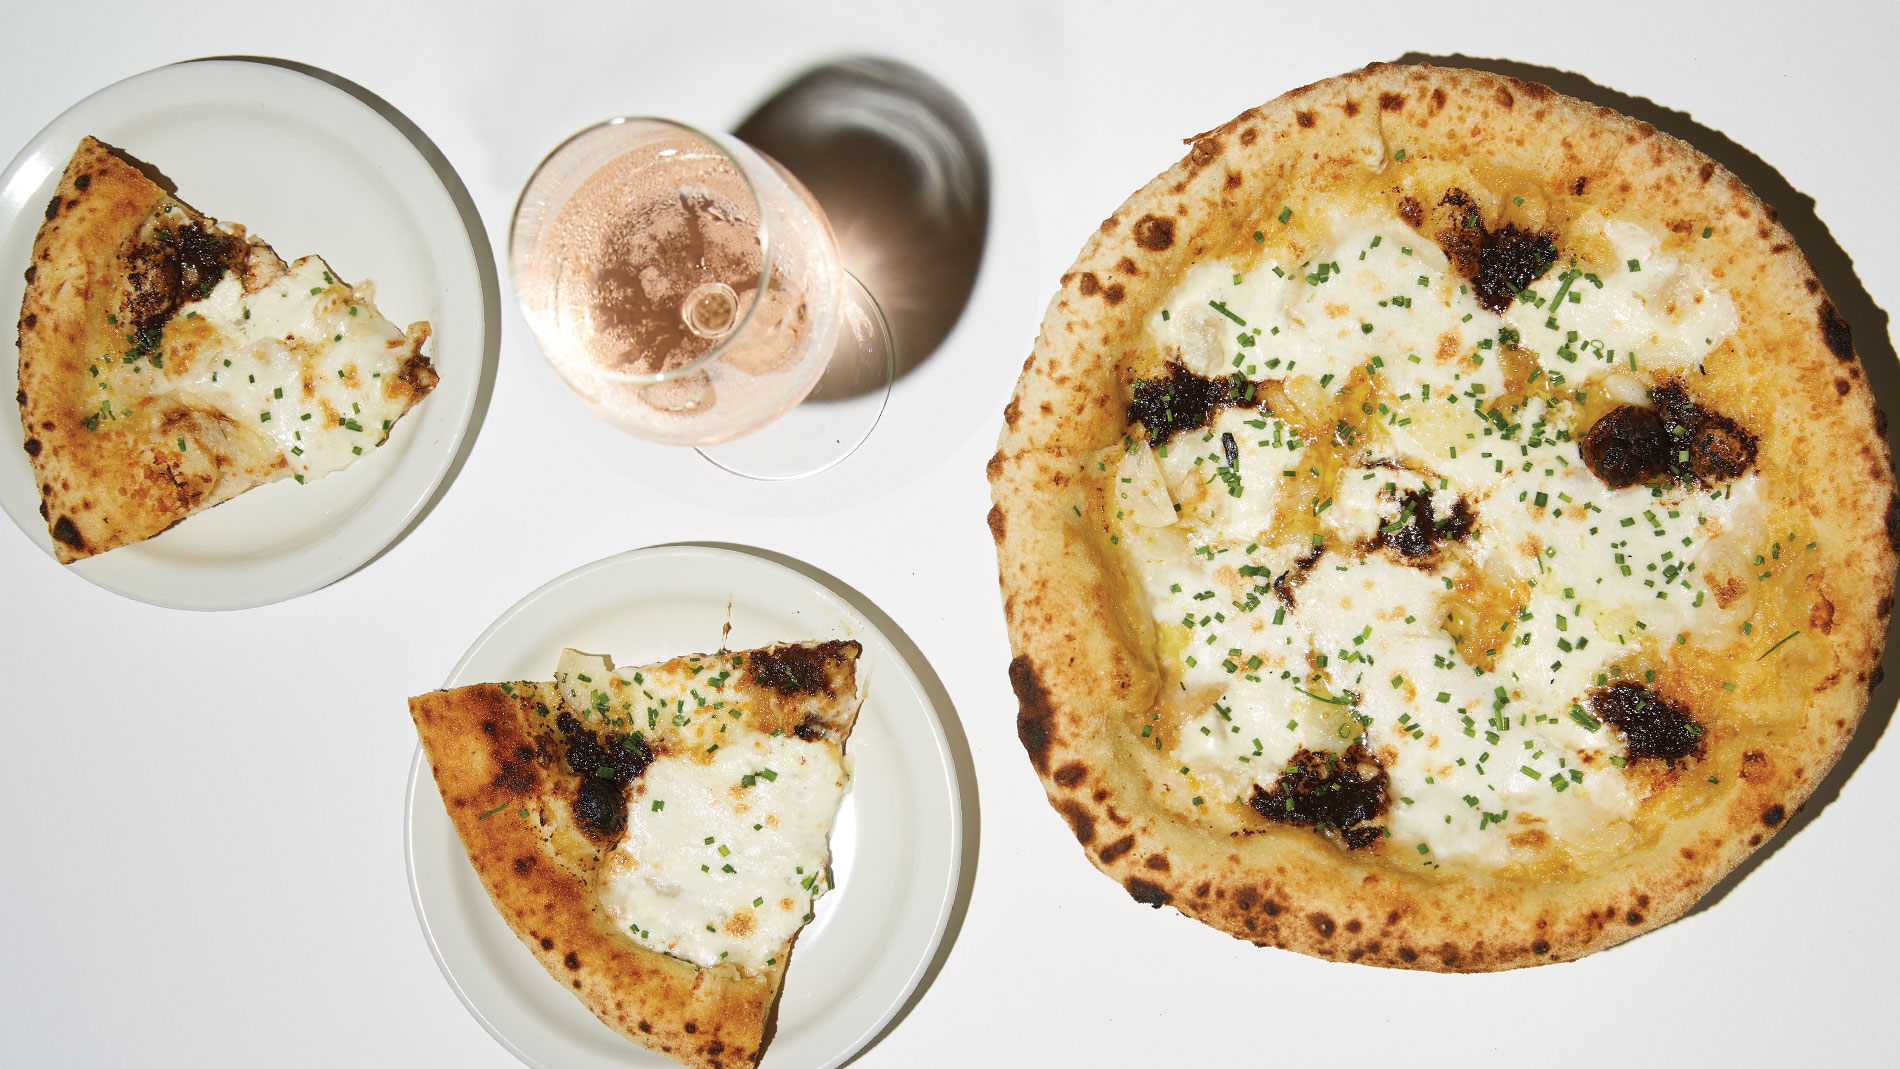 black garlic bread at Katie's Pizza & Pasta Osteria in st. louis